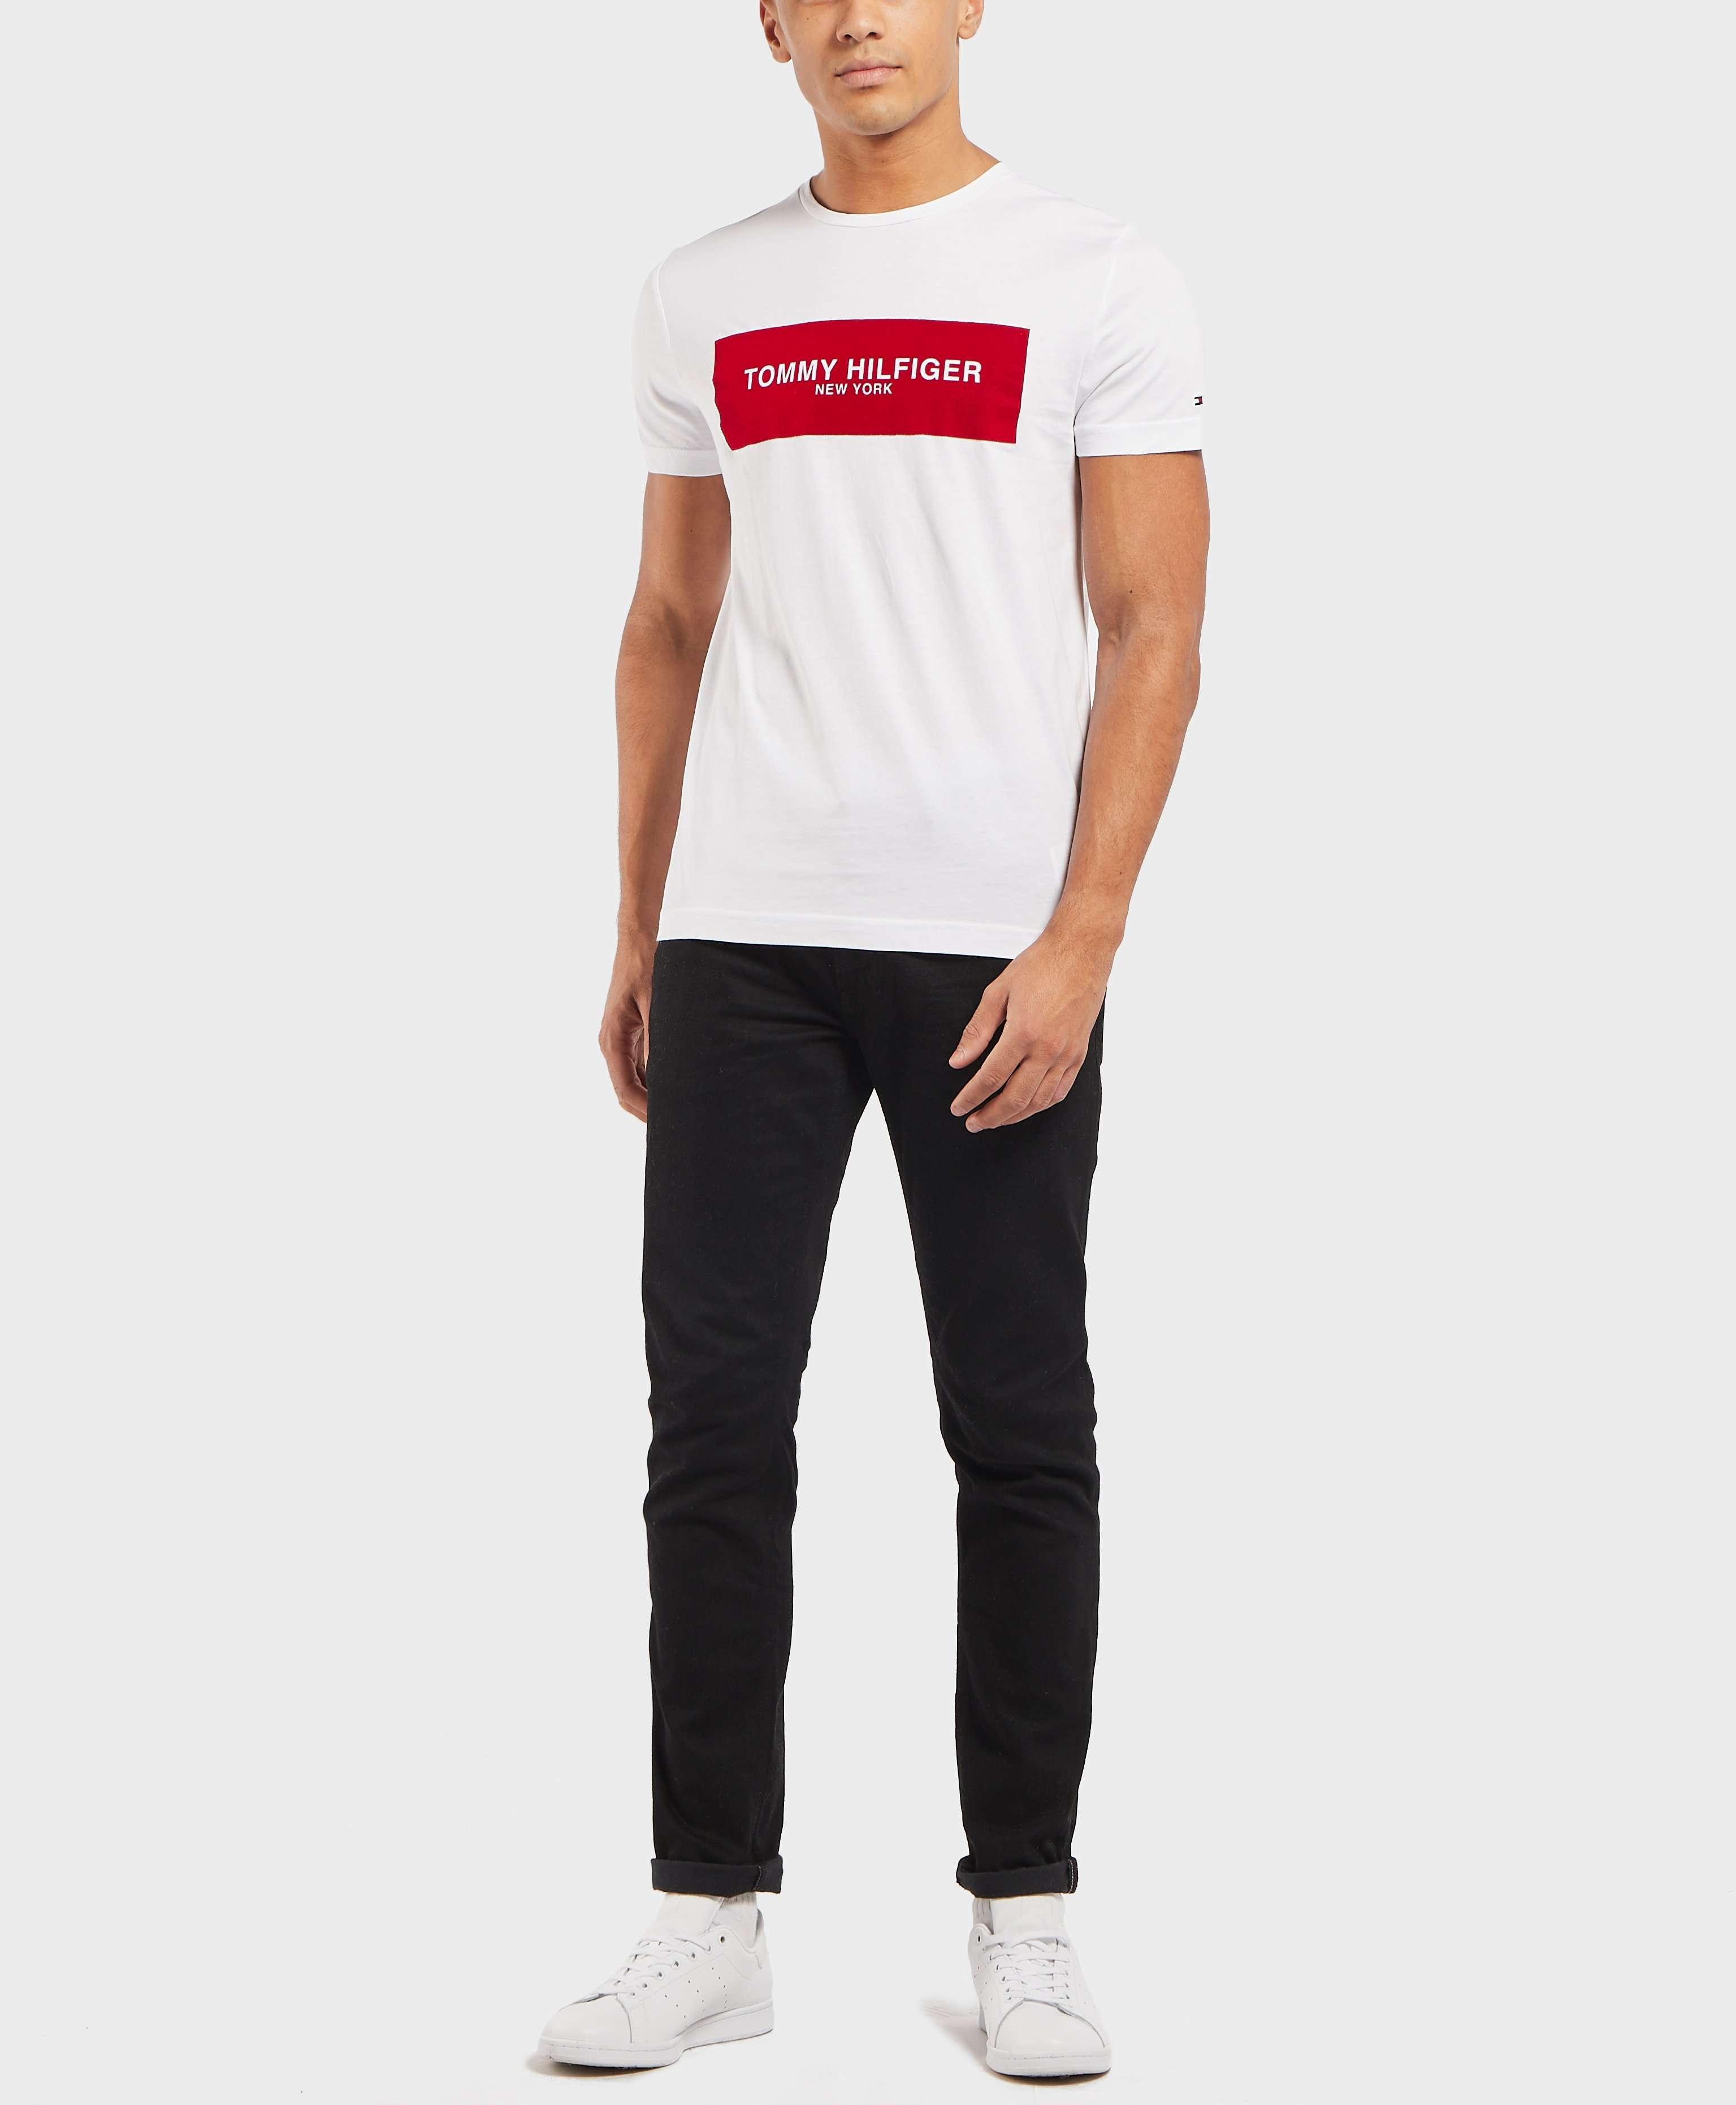 Tommy Hilfiger Box Logo T-Shirt